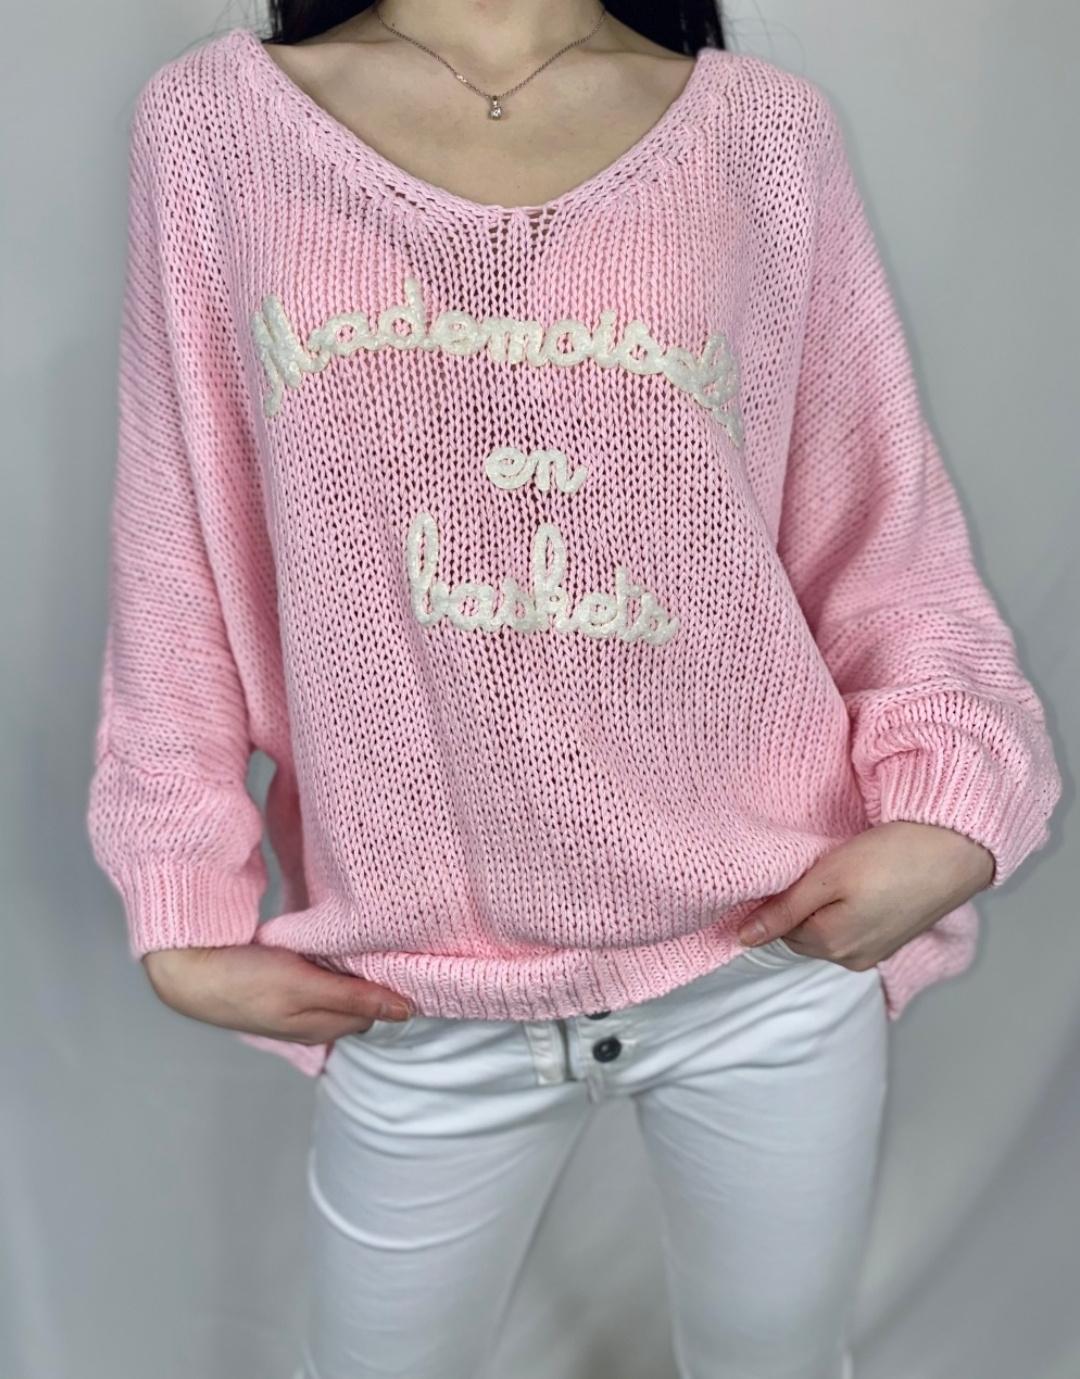 Le pull «Mady» Mademoiselle en baskets rose